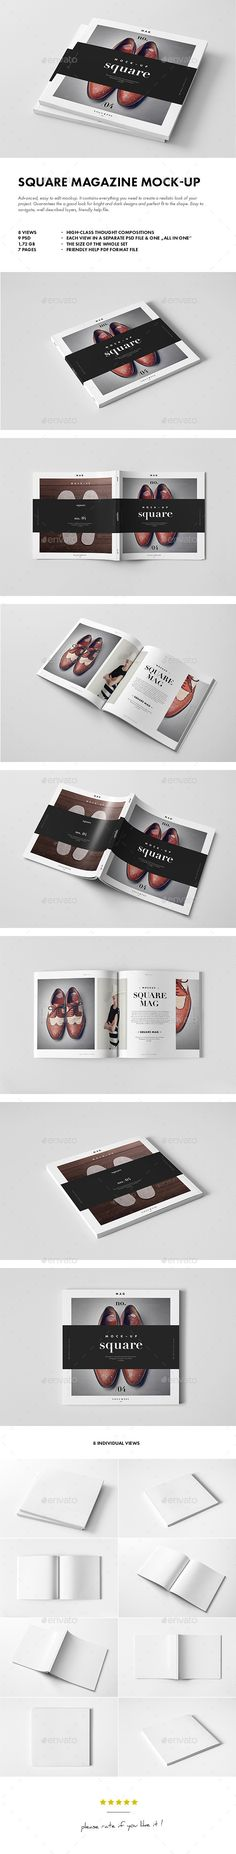 Square Magazine Mock-up | Buy and Download: http://graphicriver.net/item/square-magazine-mockup/9877732?ref=ksioks